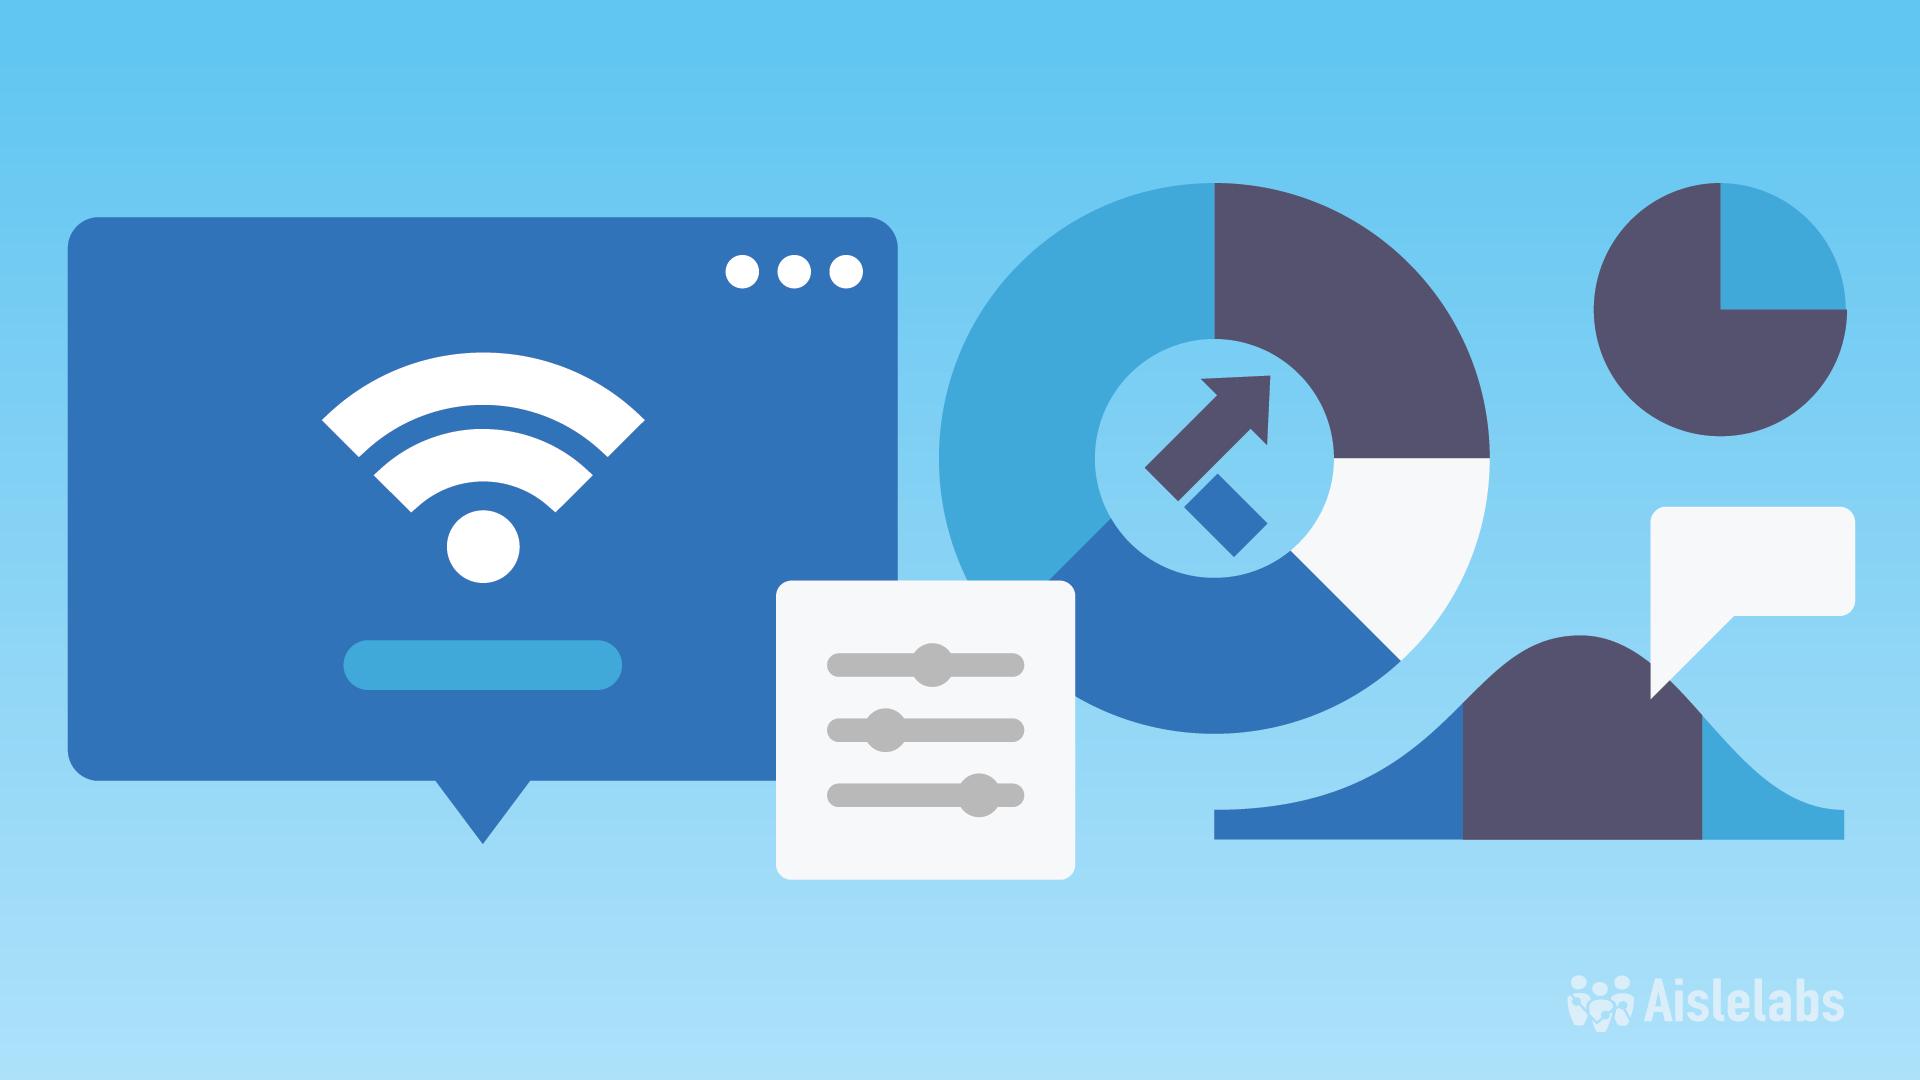 seo services qatar Assistance Experts provide digital